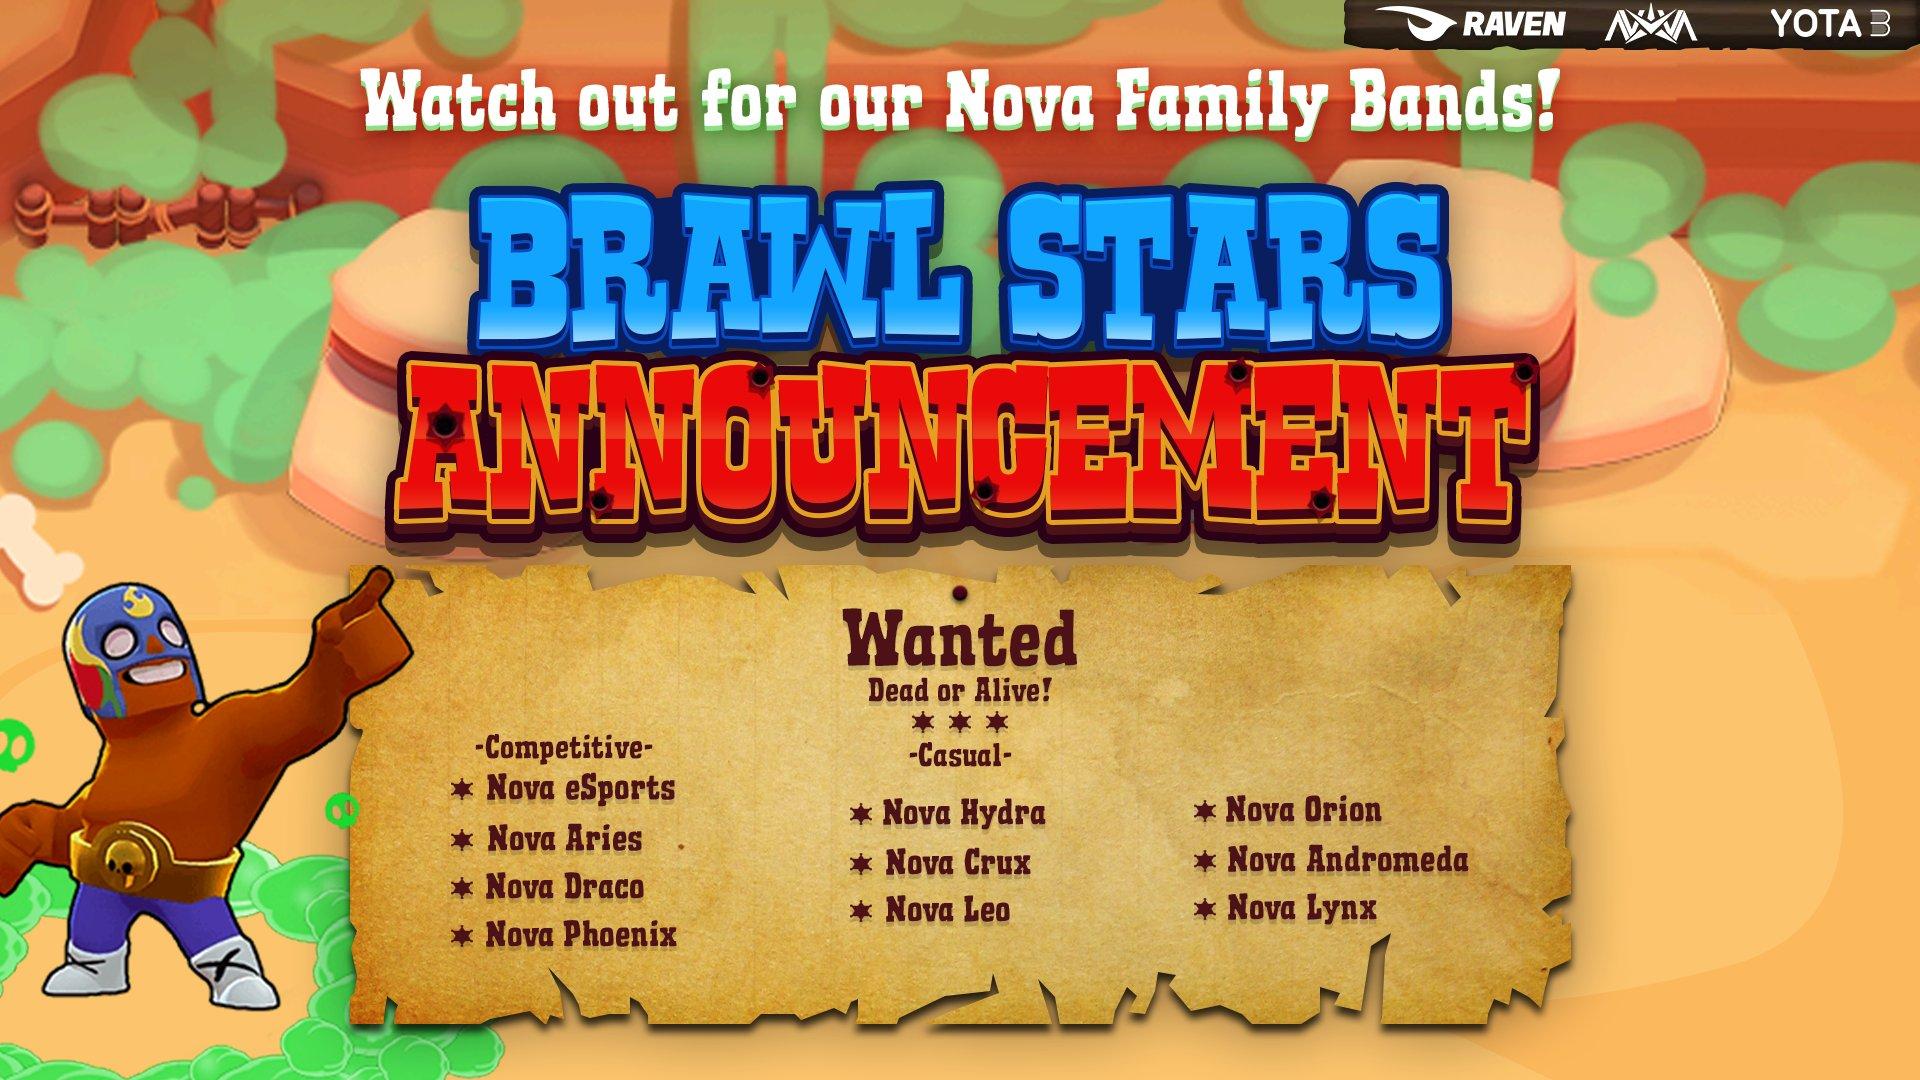 Brawl nova возврат переведенных денег